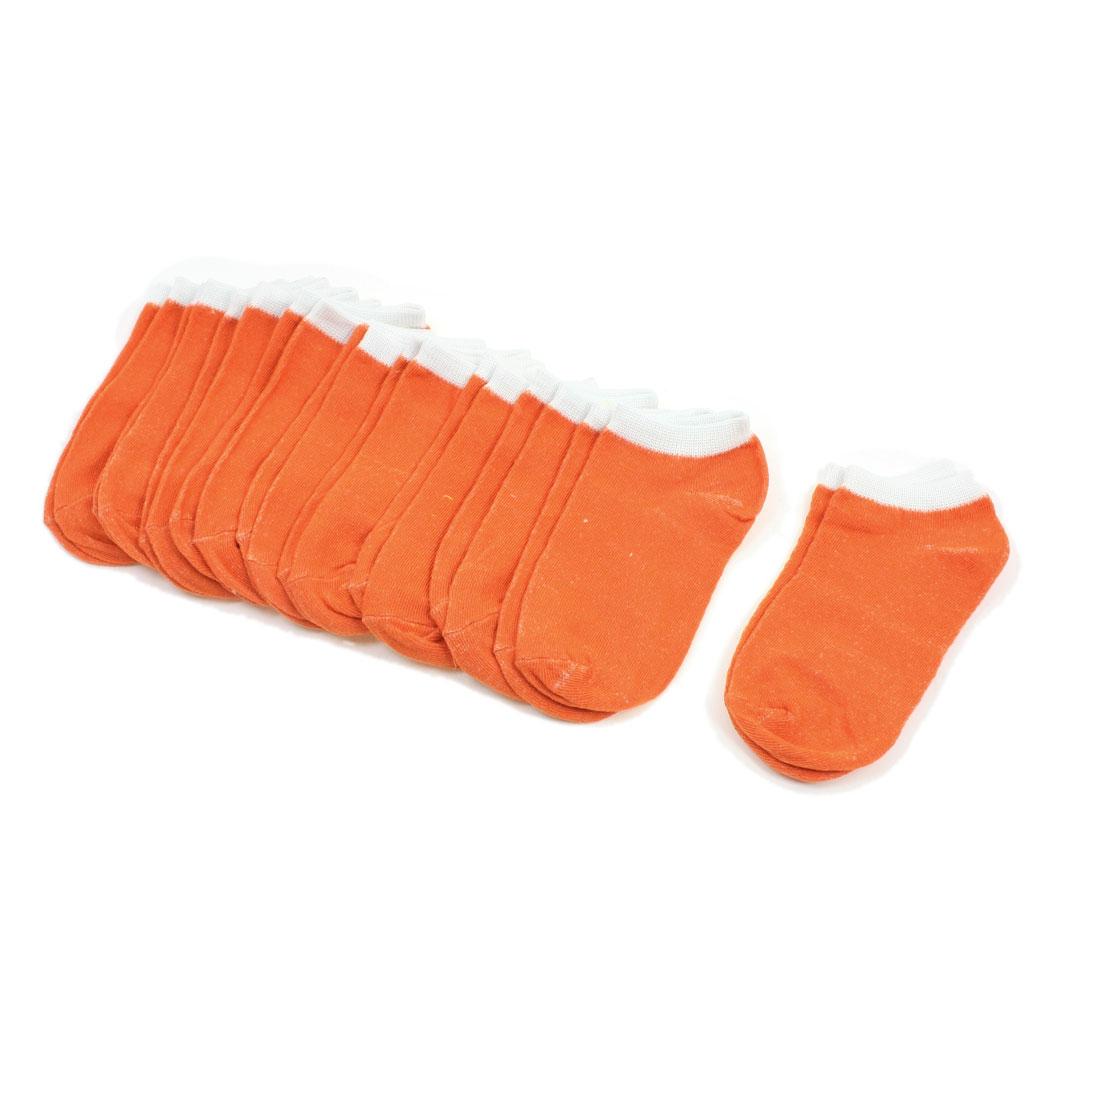 10 Pair Leisure Sport Girl Stretch Ankle Low Cut Socks Orange White